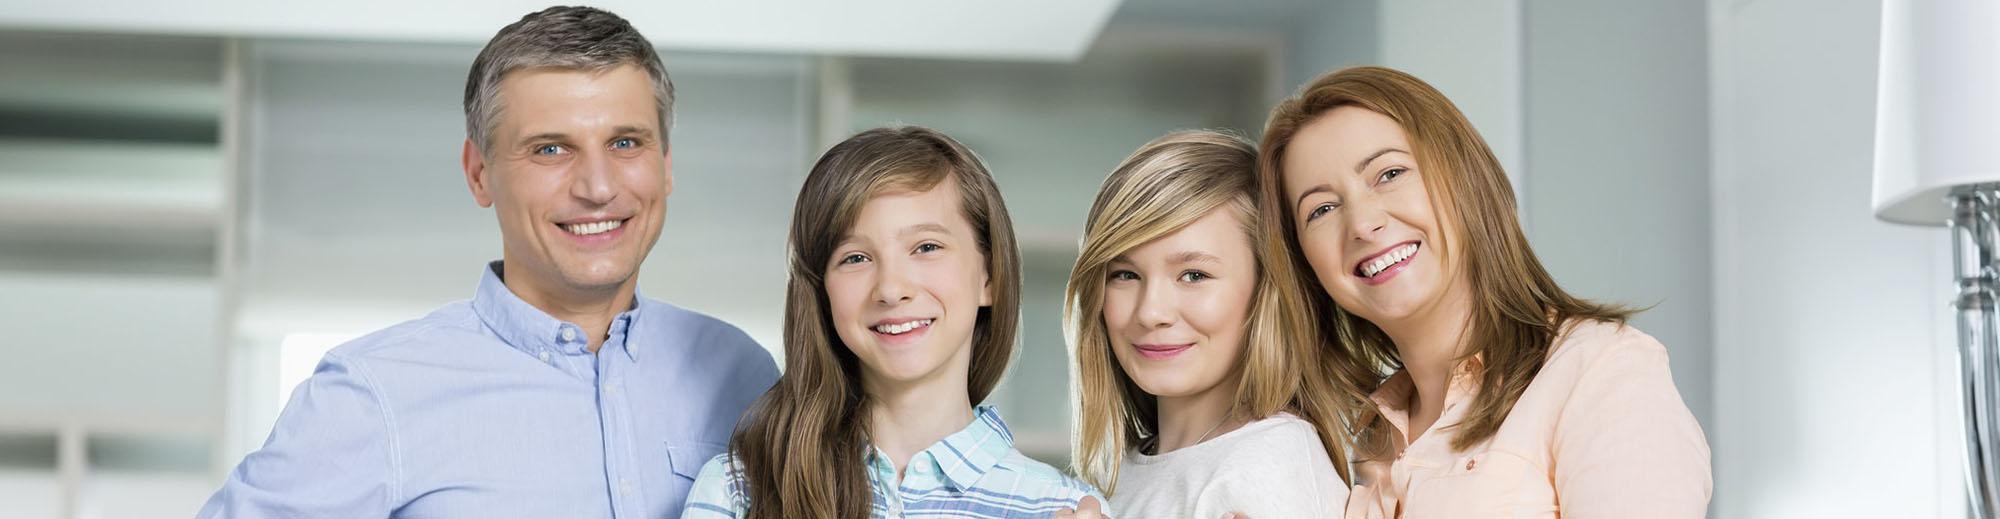 James King DDS: Total Family Dentistry | Dentist - Chehalis Centralia WA